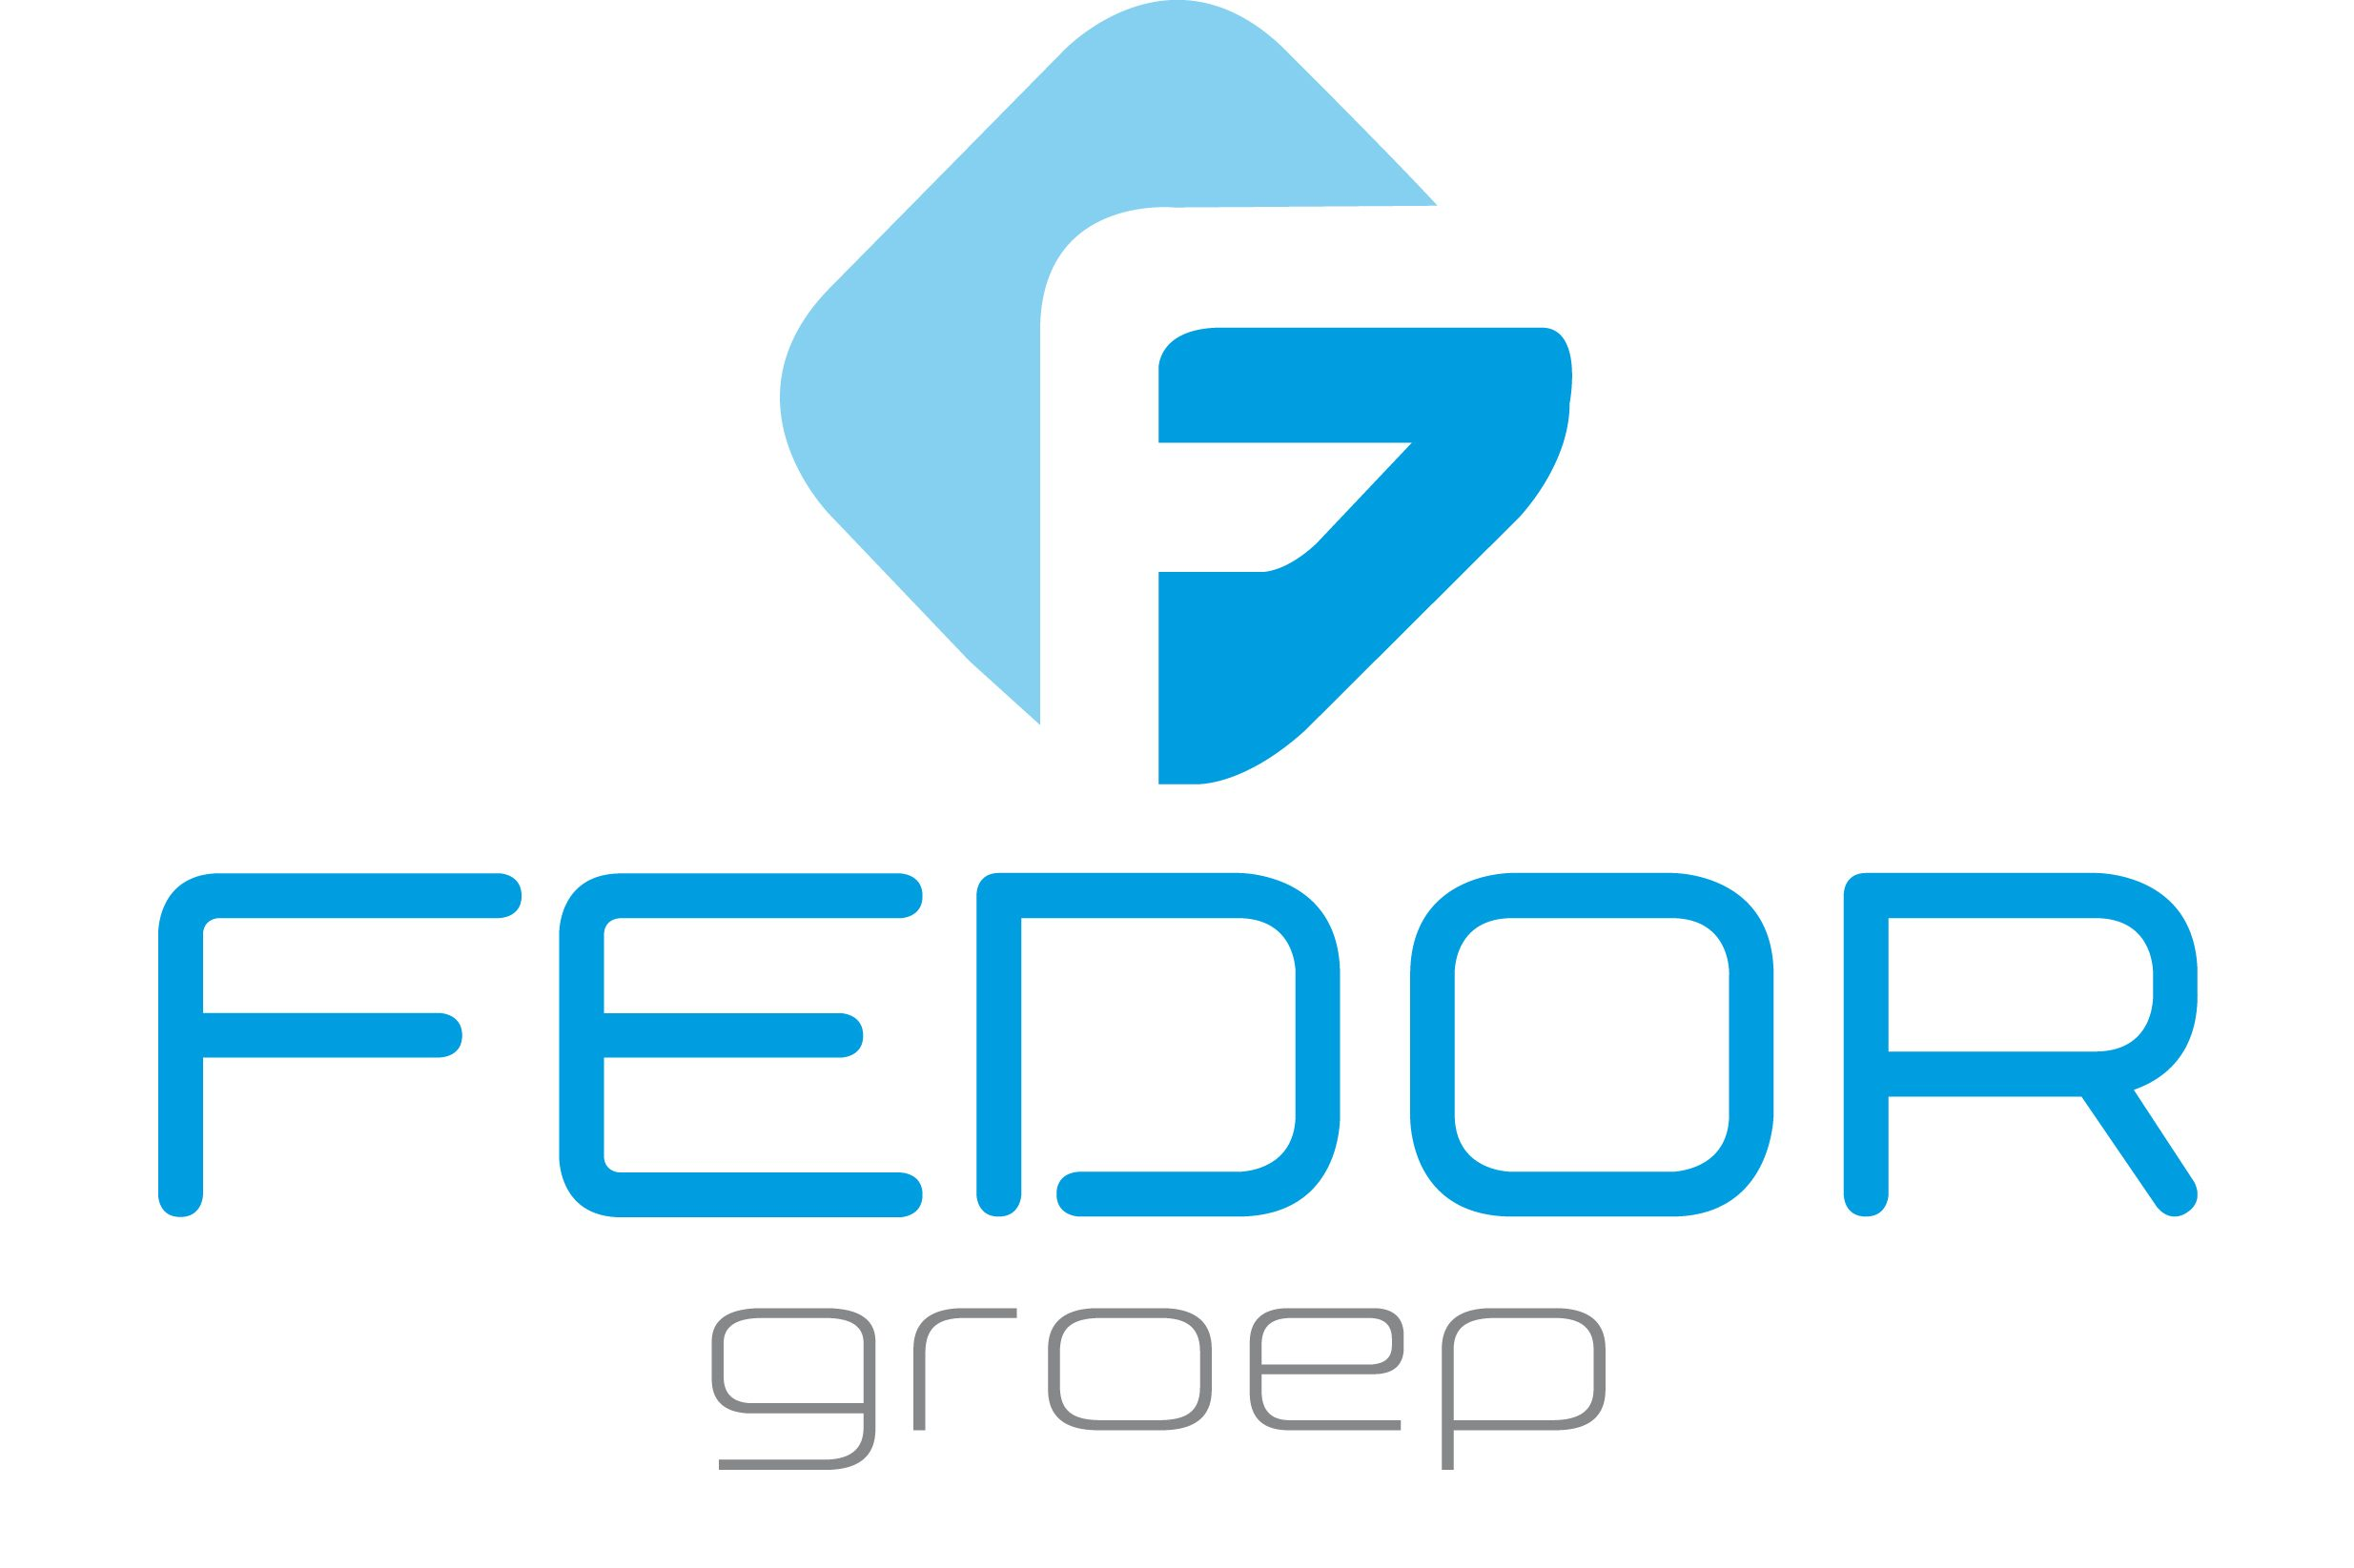 FEDORgroep